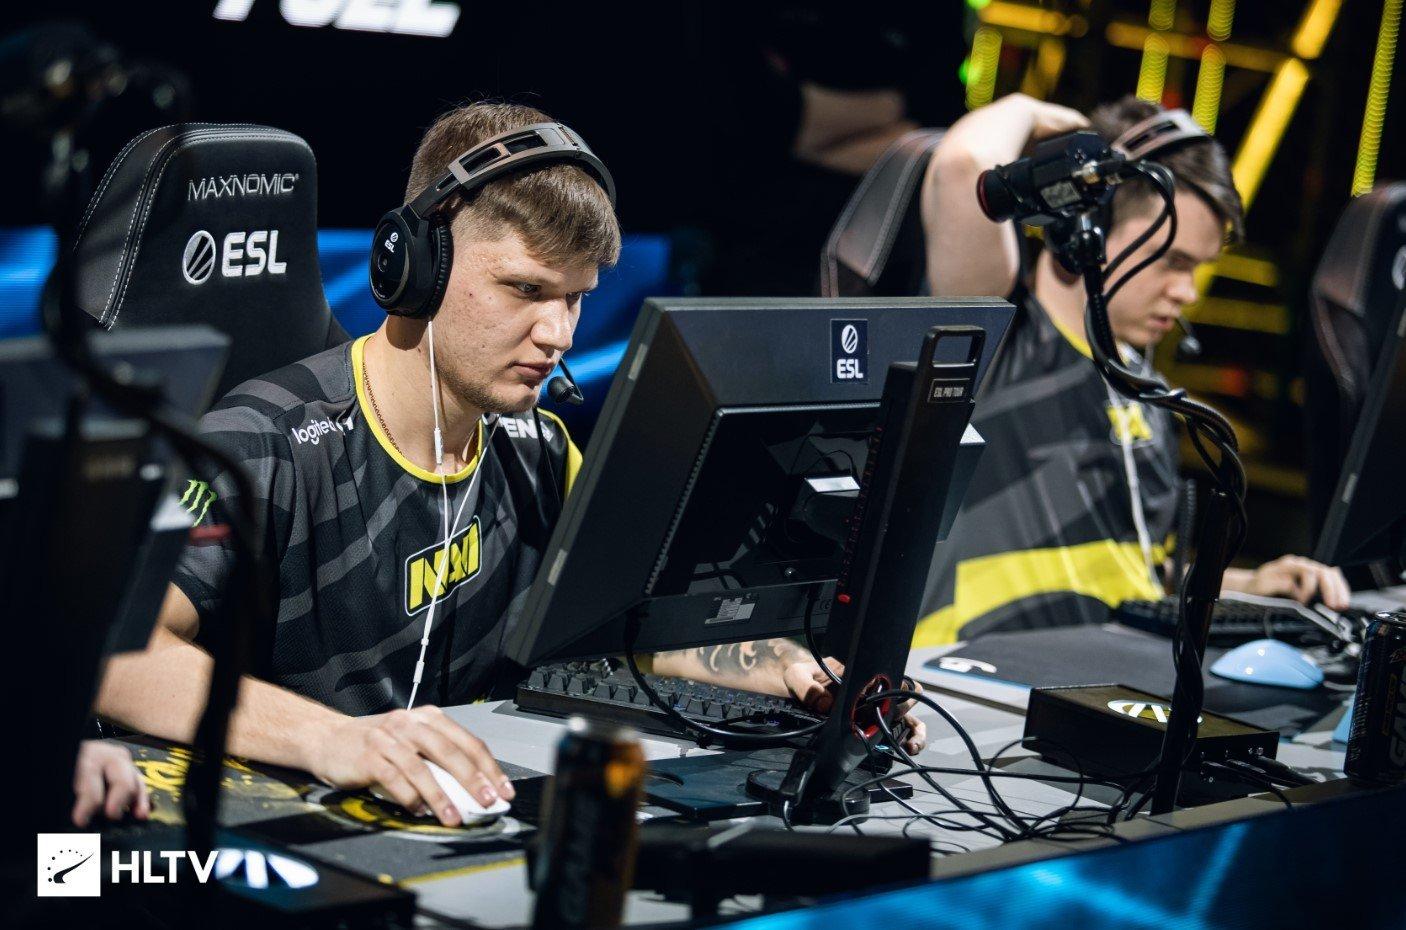 Natus Vincere проиграли G2 Esports в рамках DreamHack Masters 2020